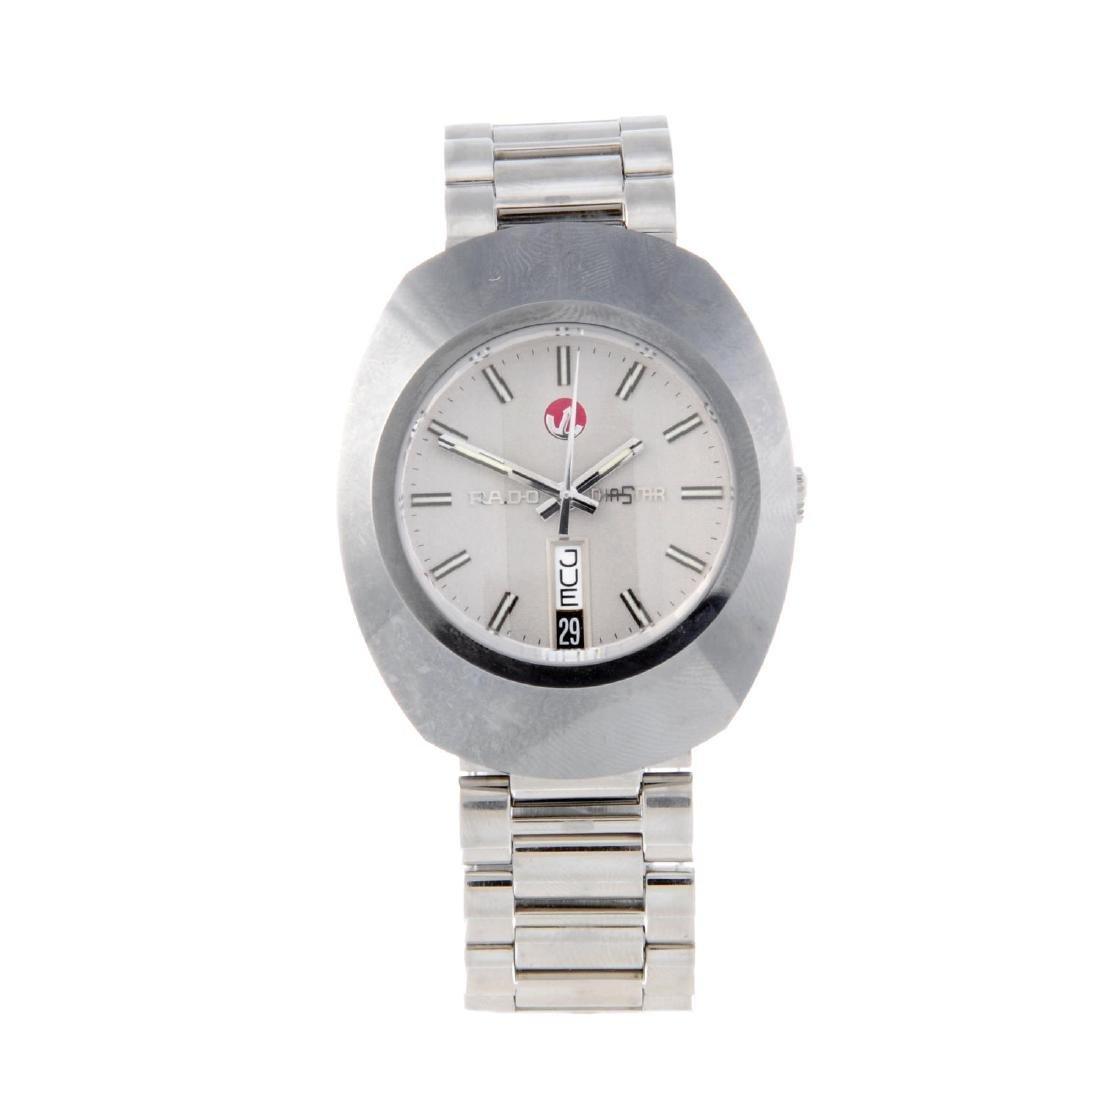 RADO - a gentleman's DiaStar bracelet watch.